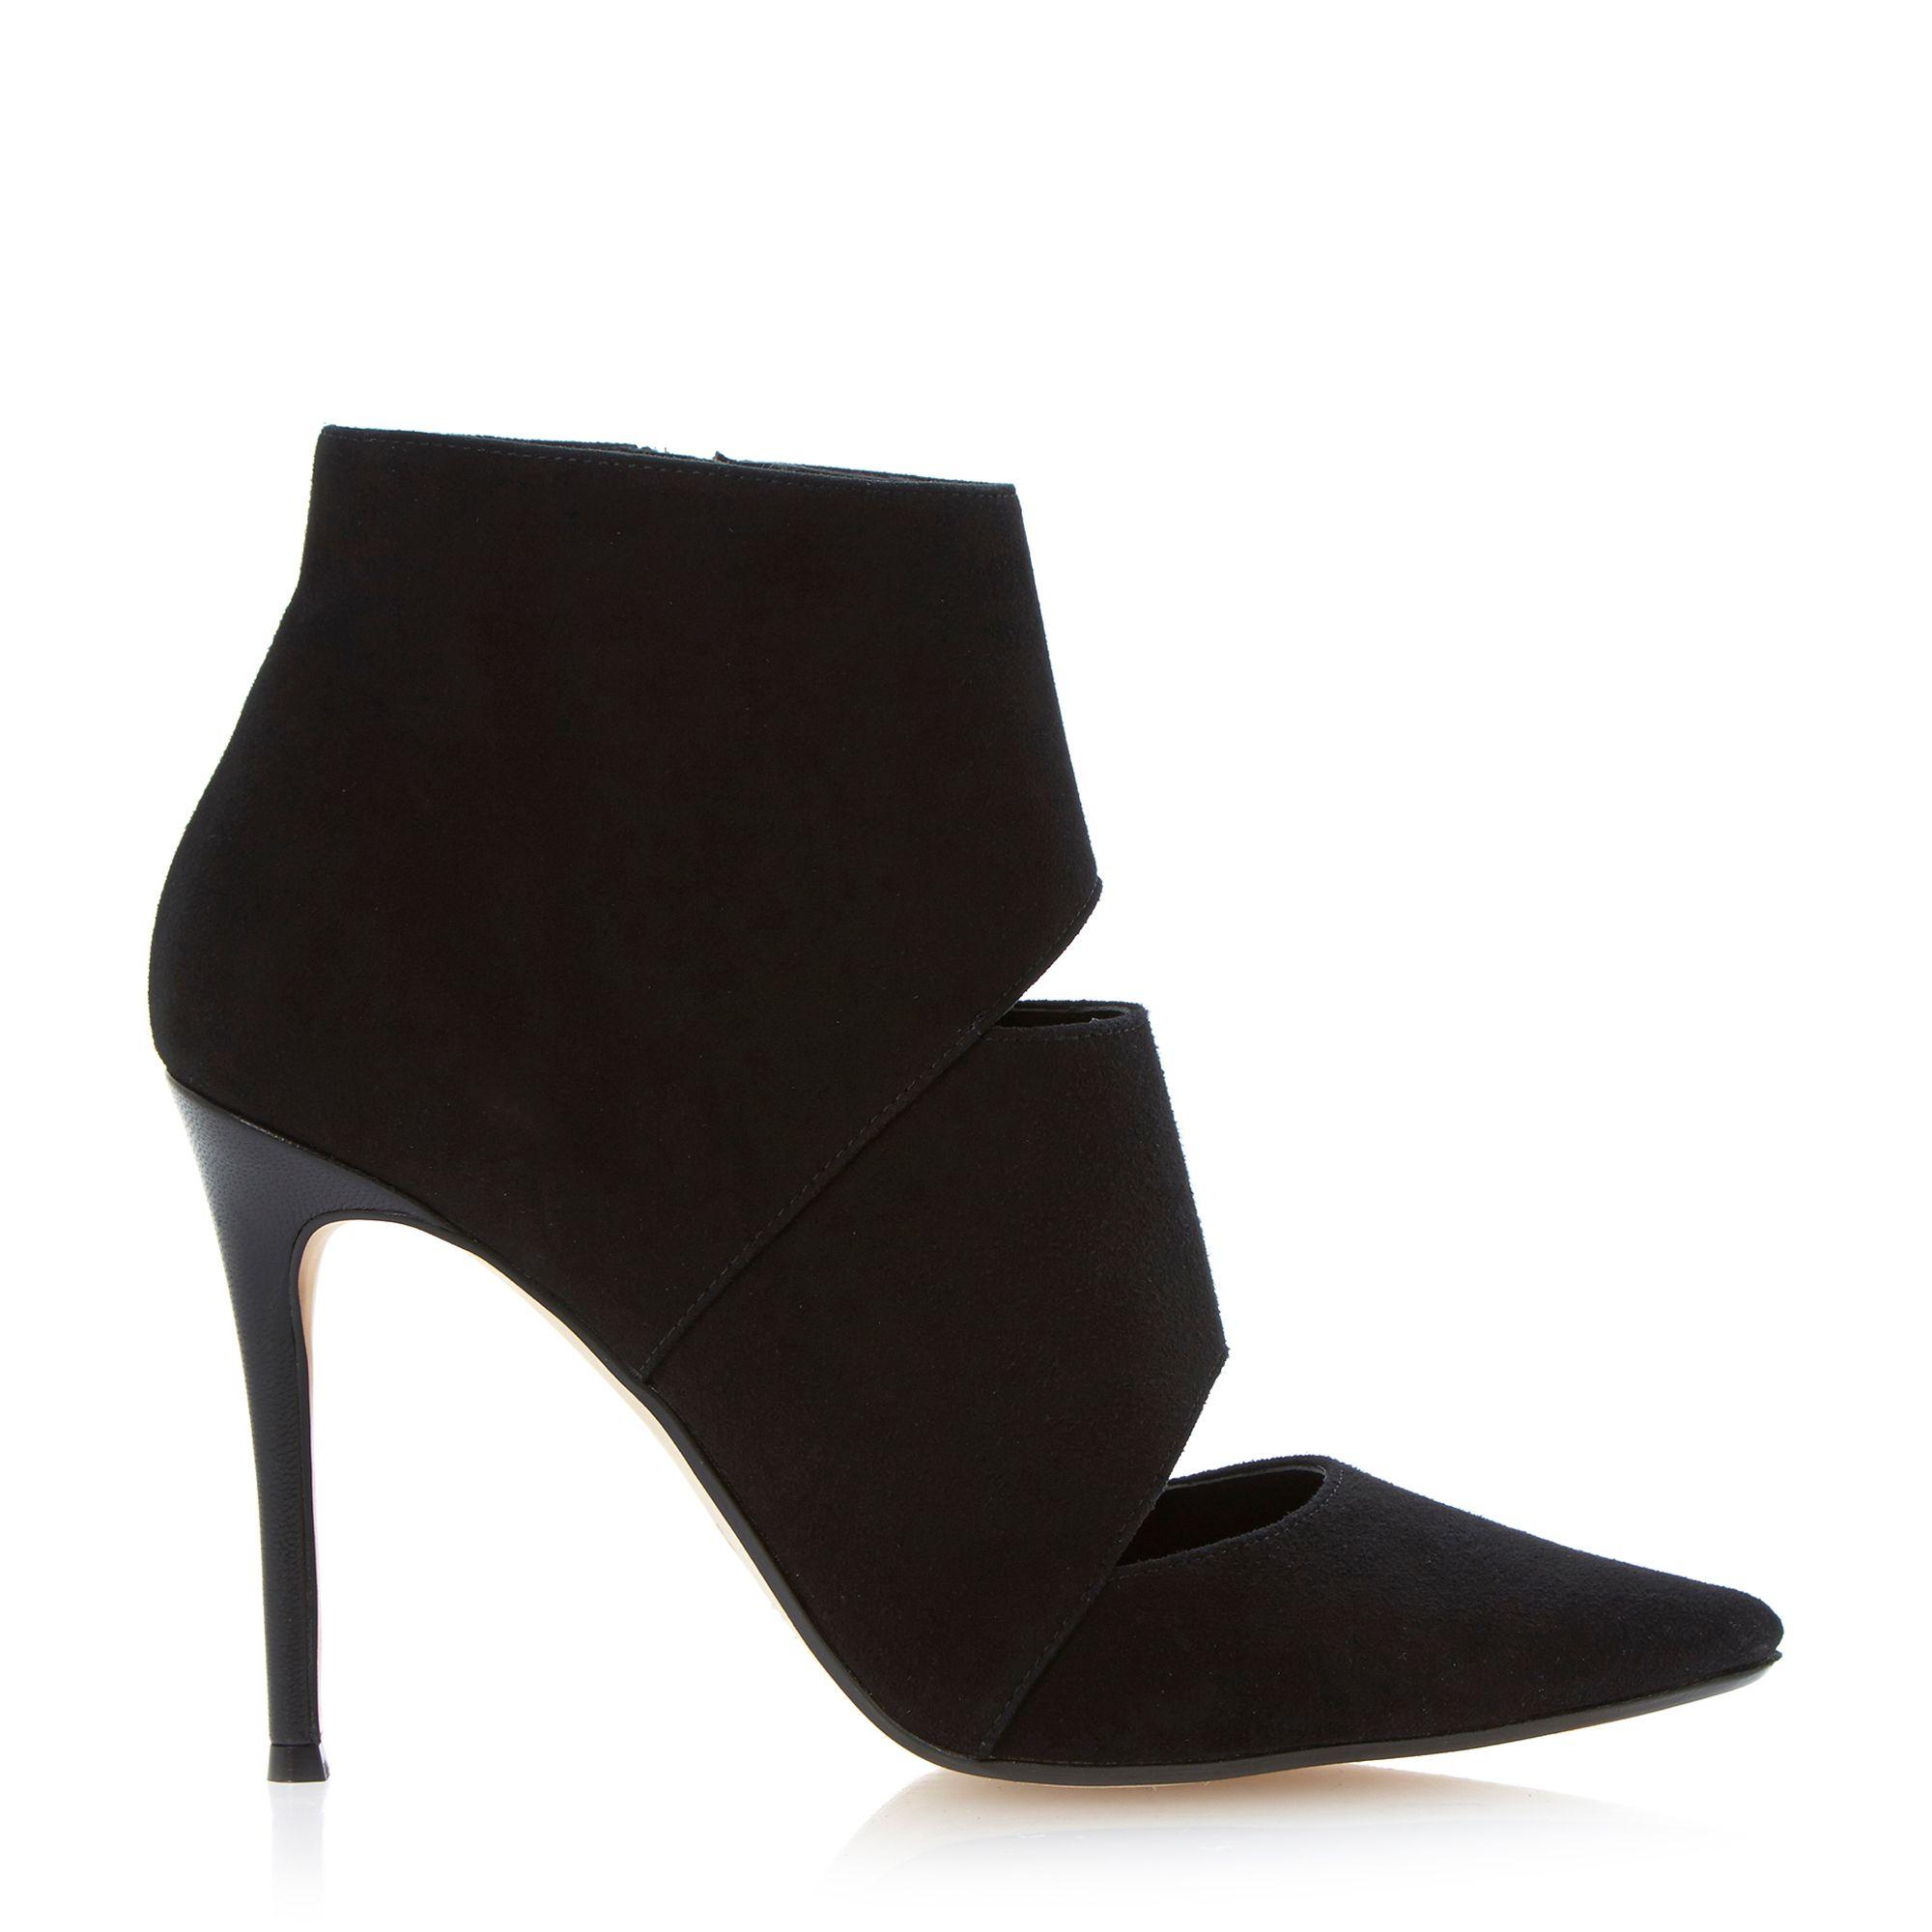 dune adrianne cutout heeled shoe boot in black lyst